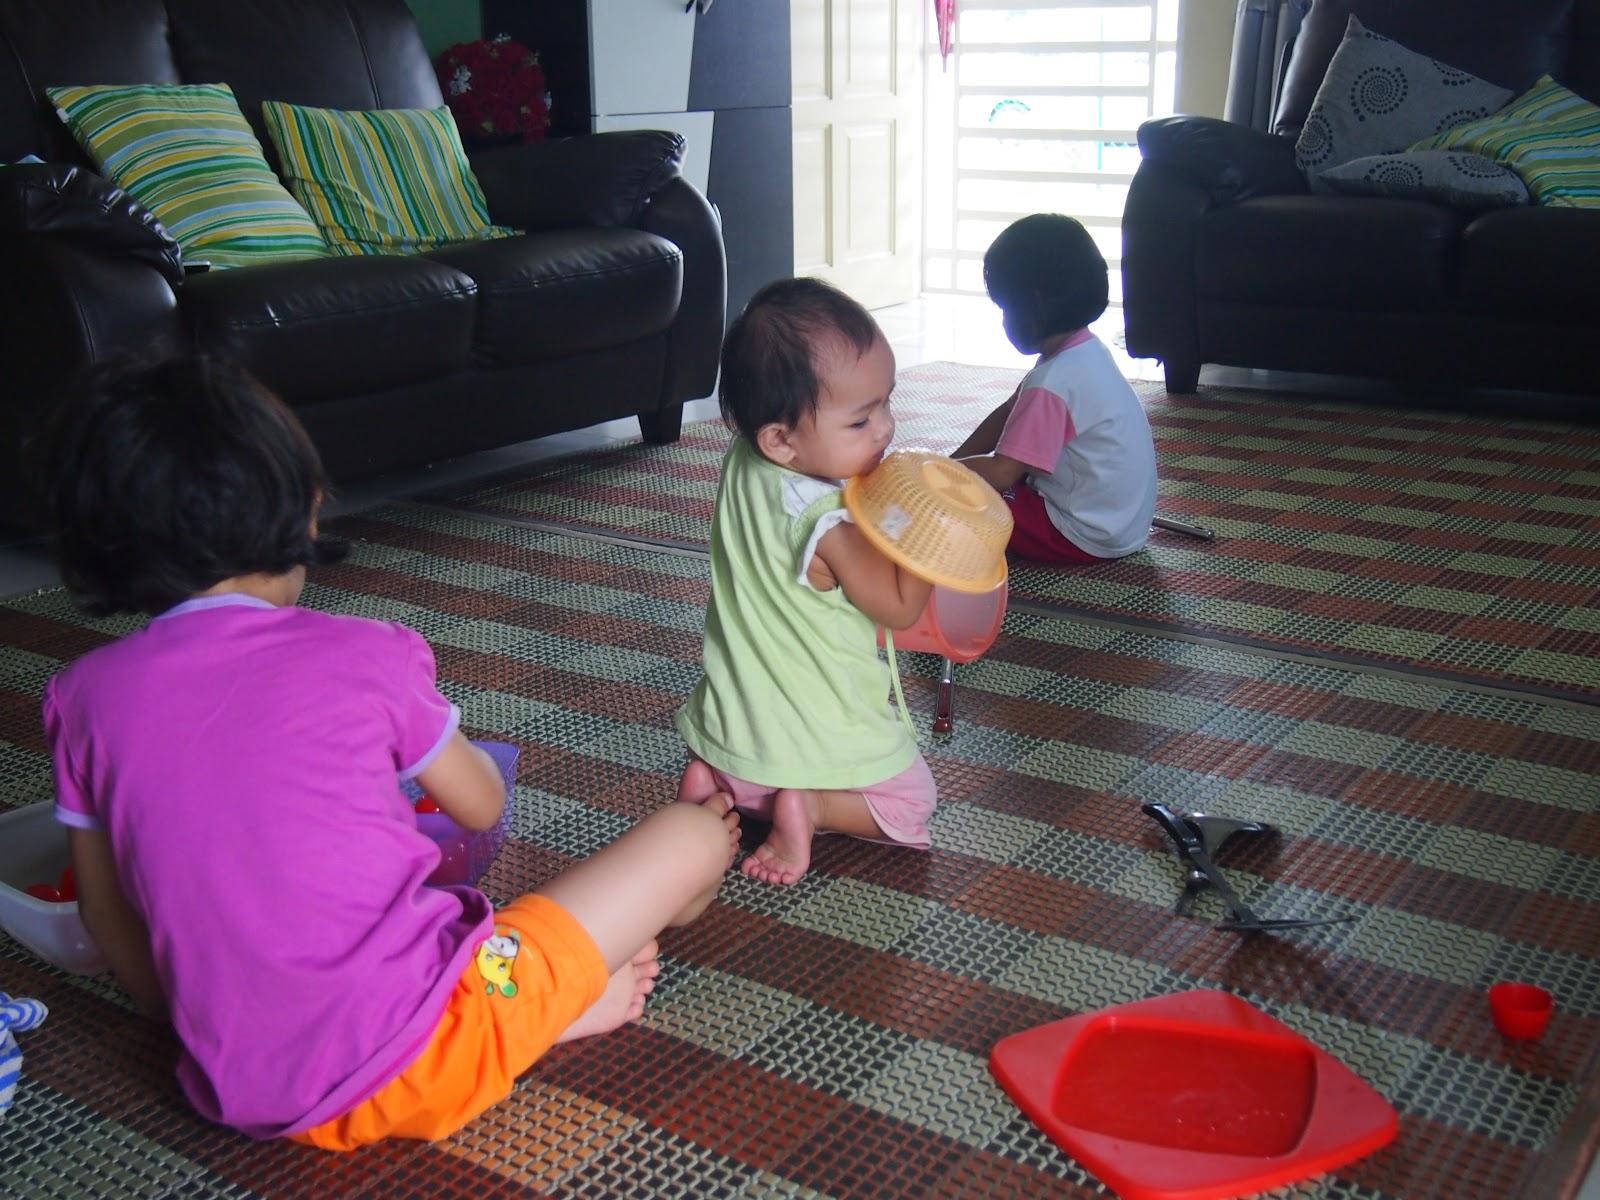 Inilah Aktiviti Anak Hujung Minggu Nie Habis Senduk Nasi Untuk Menggoreng Sup Sudu Tupperware Kecik Besar Dan Cawan Plastik